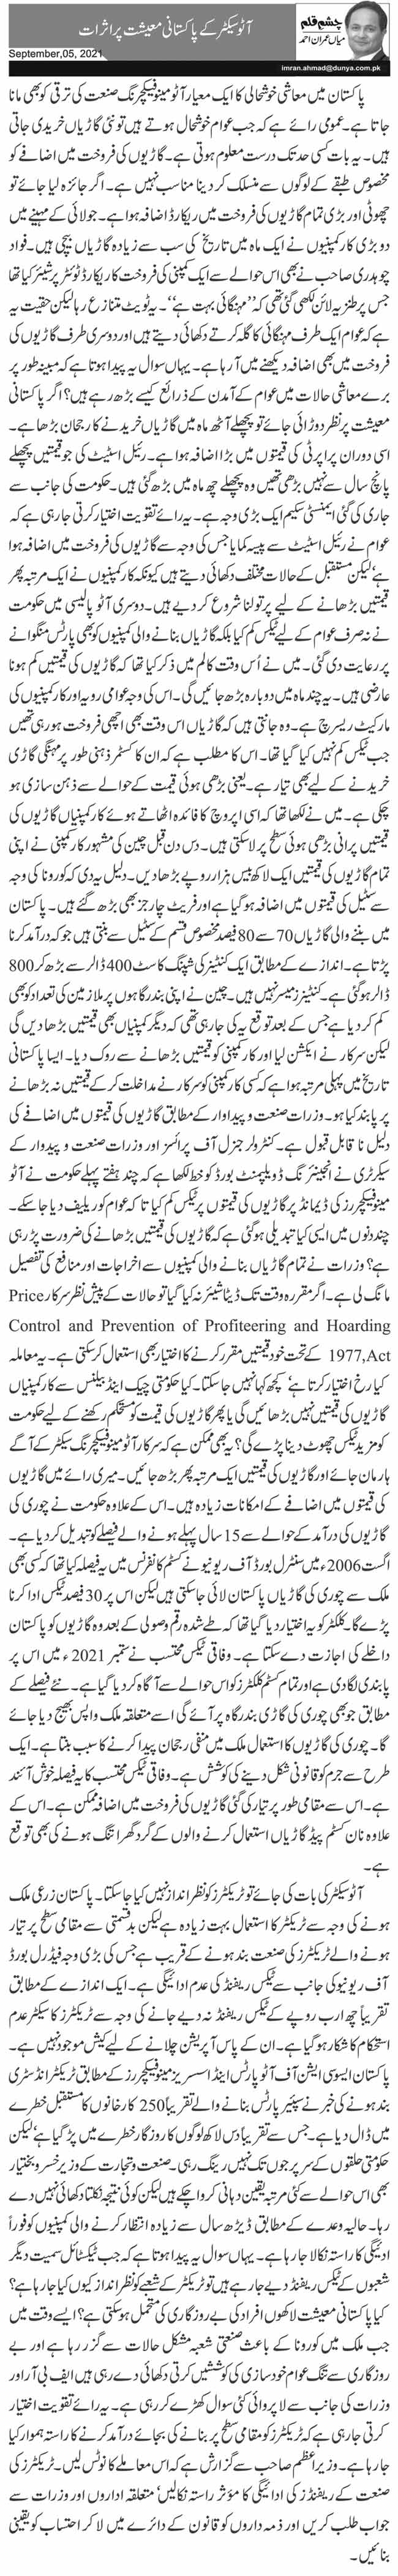 آٹو سیکٹر کے پاکستانی معیشت پر اثرات